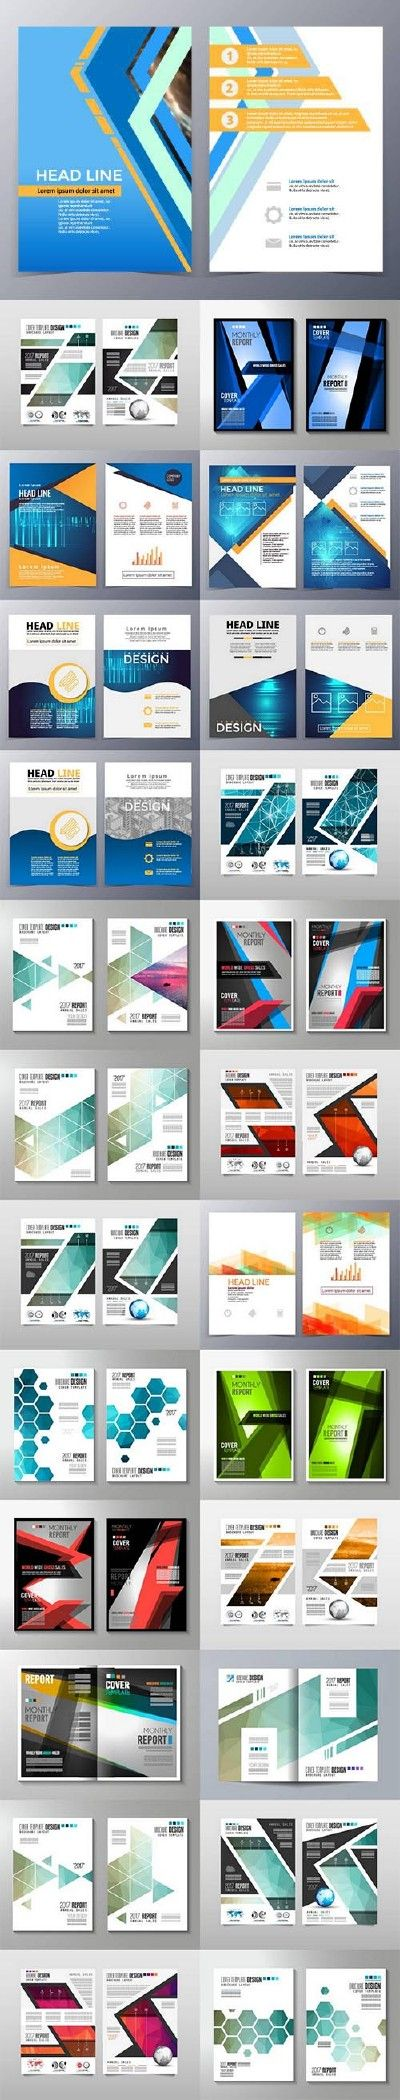 Business cover flyers brochure design